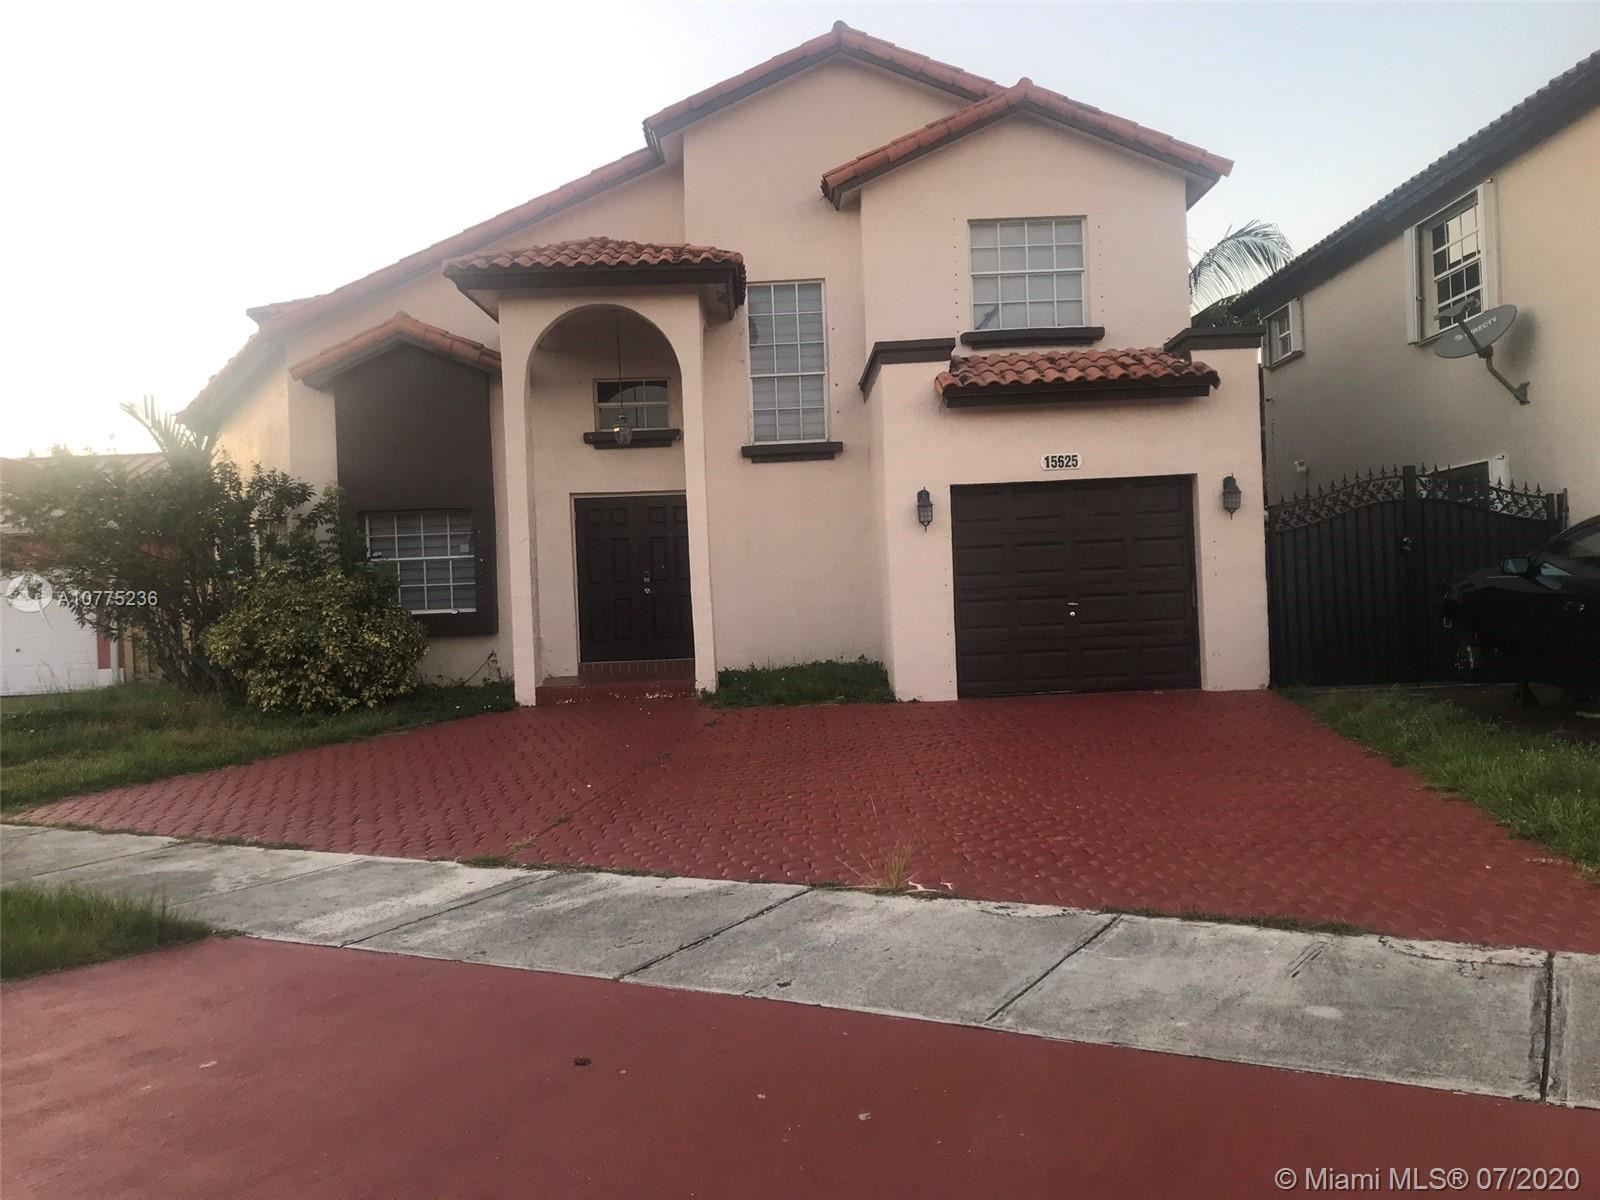 15625 SW 62nd Ter, Miami, FL 33193 - #: A10775236